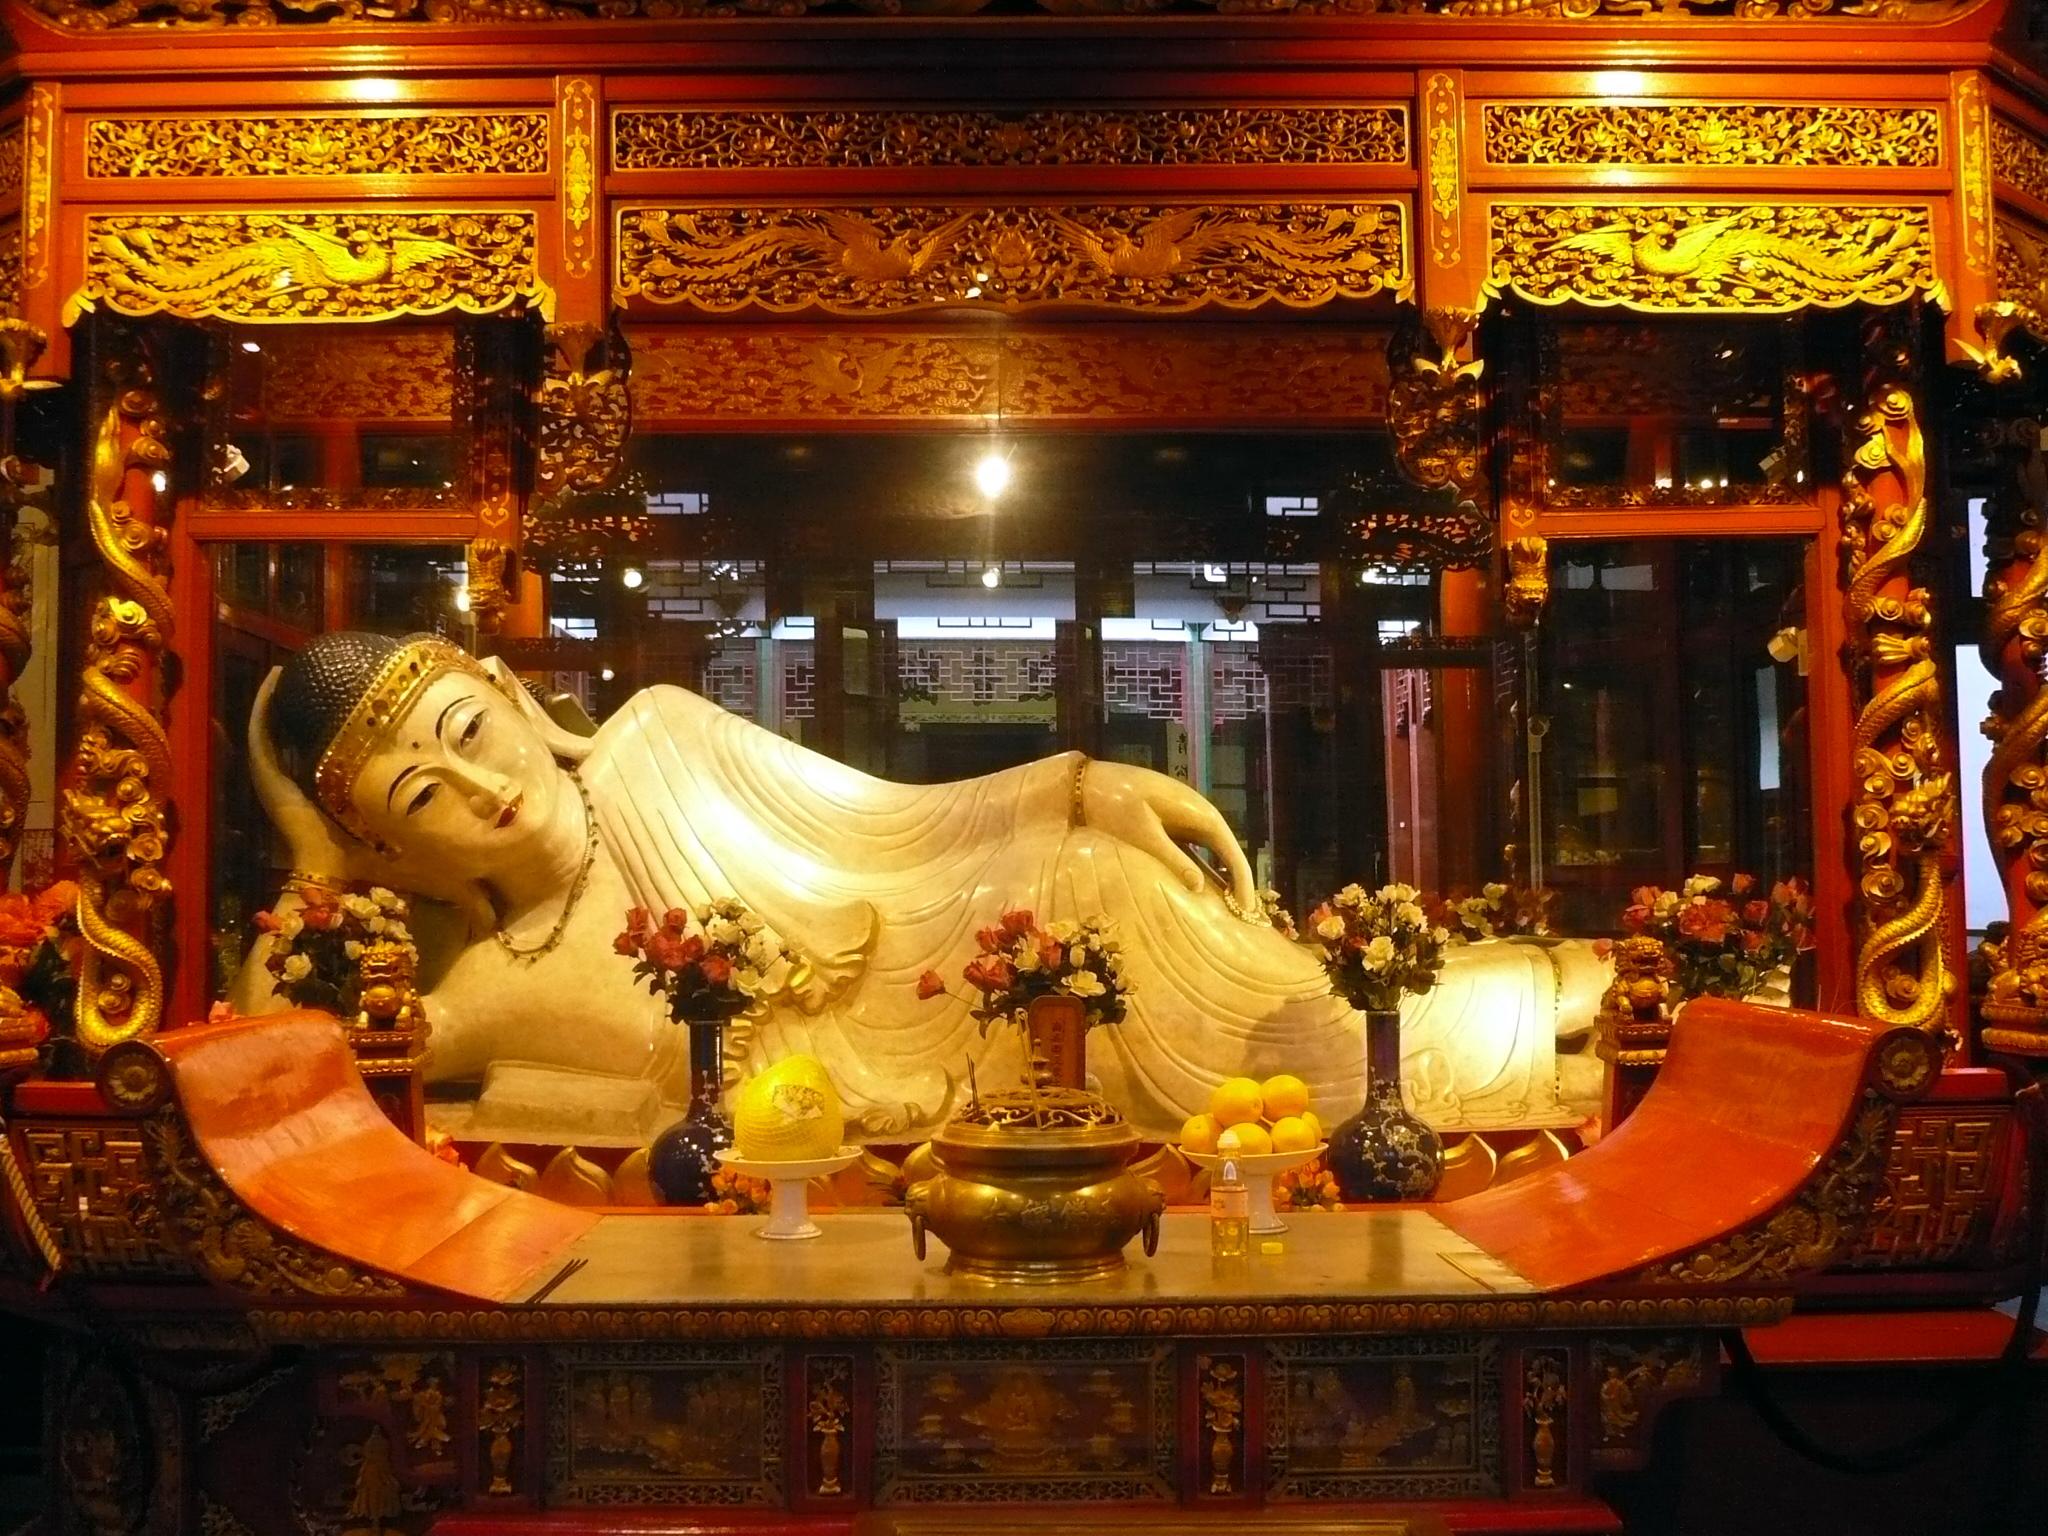 Le Bouddha de Jade à Shanghaï